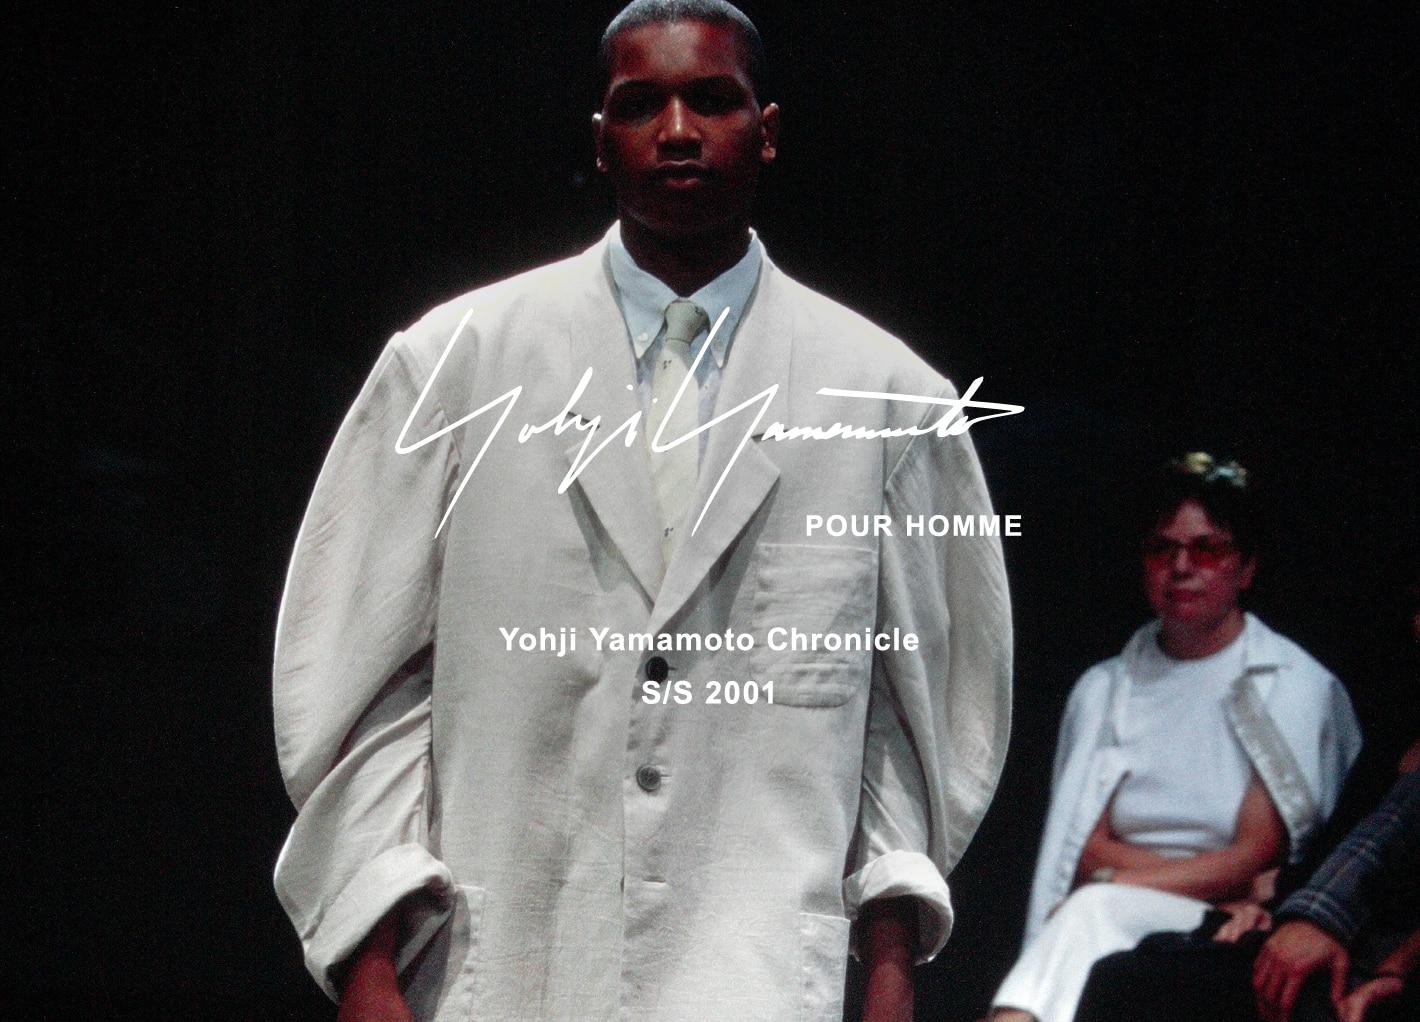 Yohji Yamamoto Chronicle – POUR HOMME S/S 2001